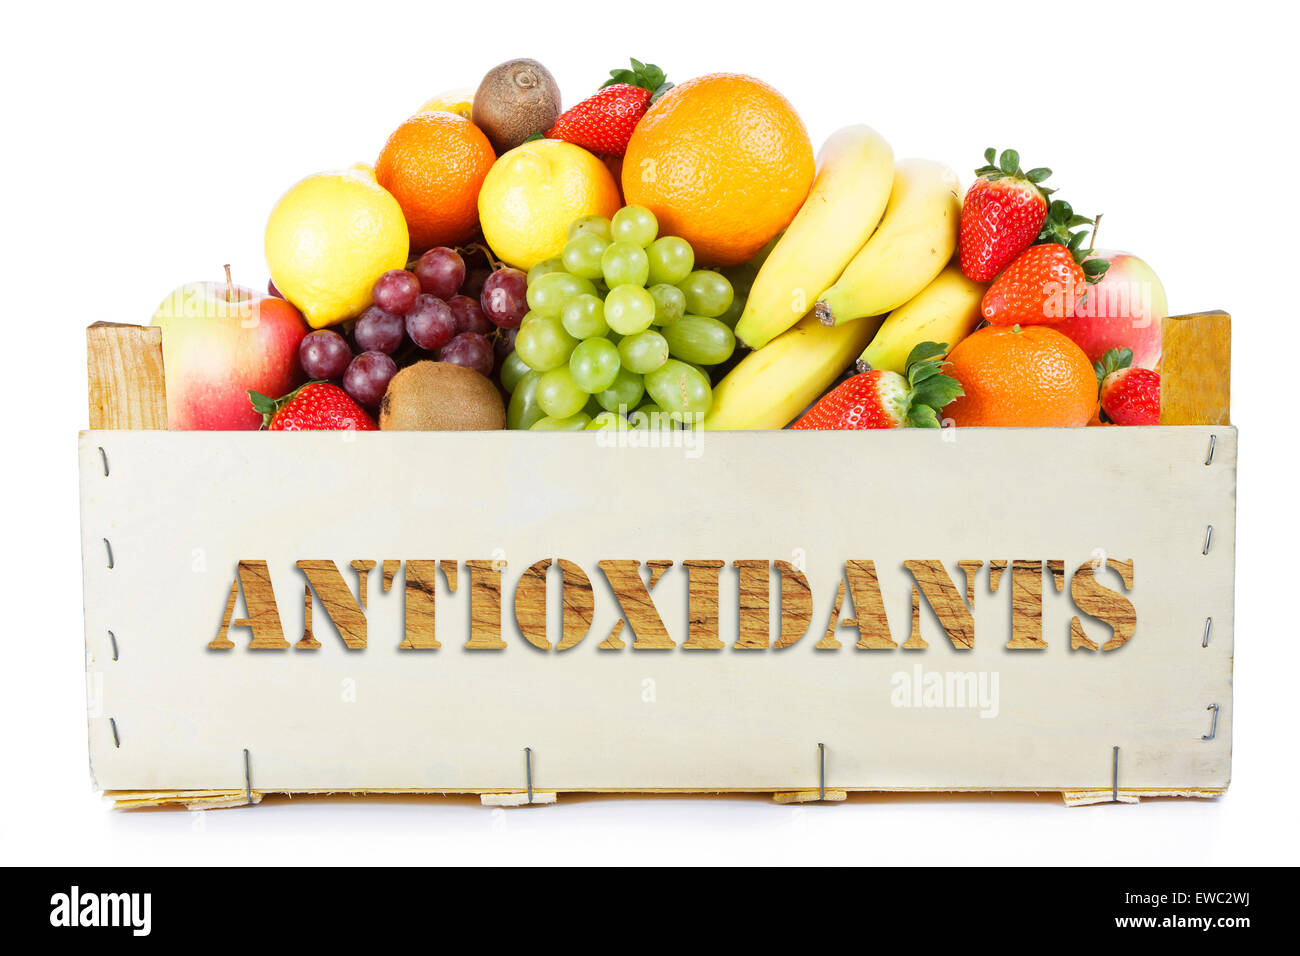 Antioxydants. Les fruits en boîte en bois. Photo Stock